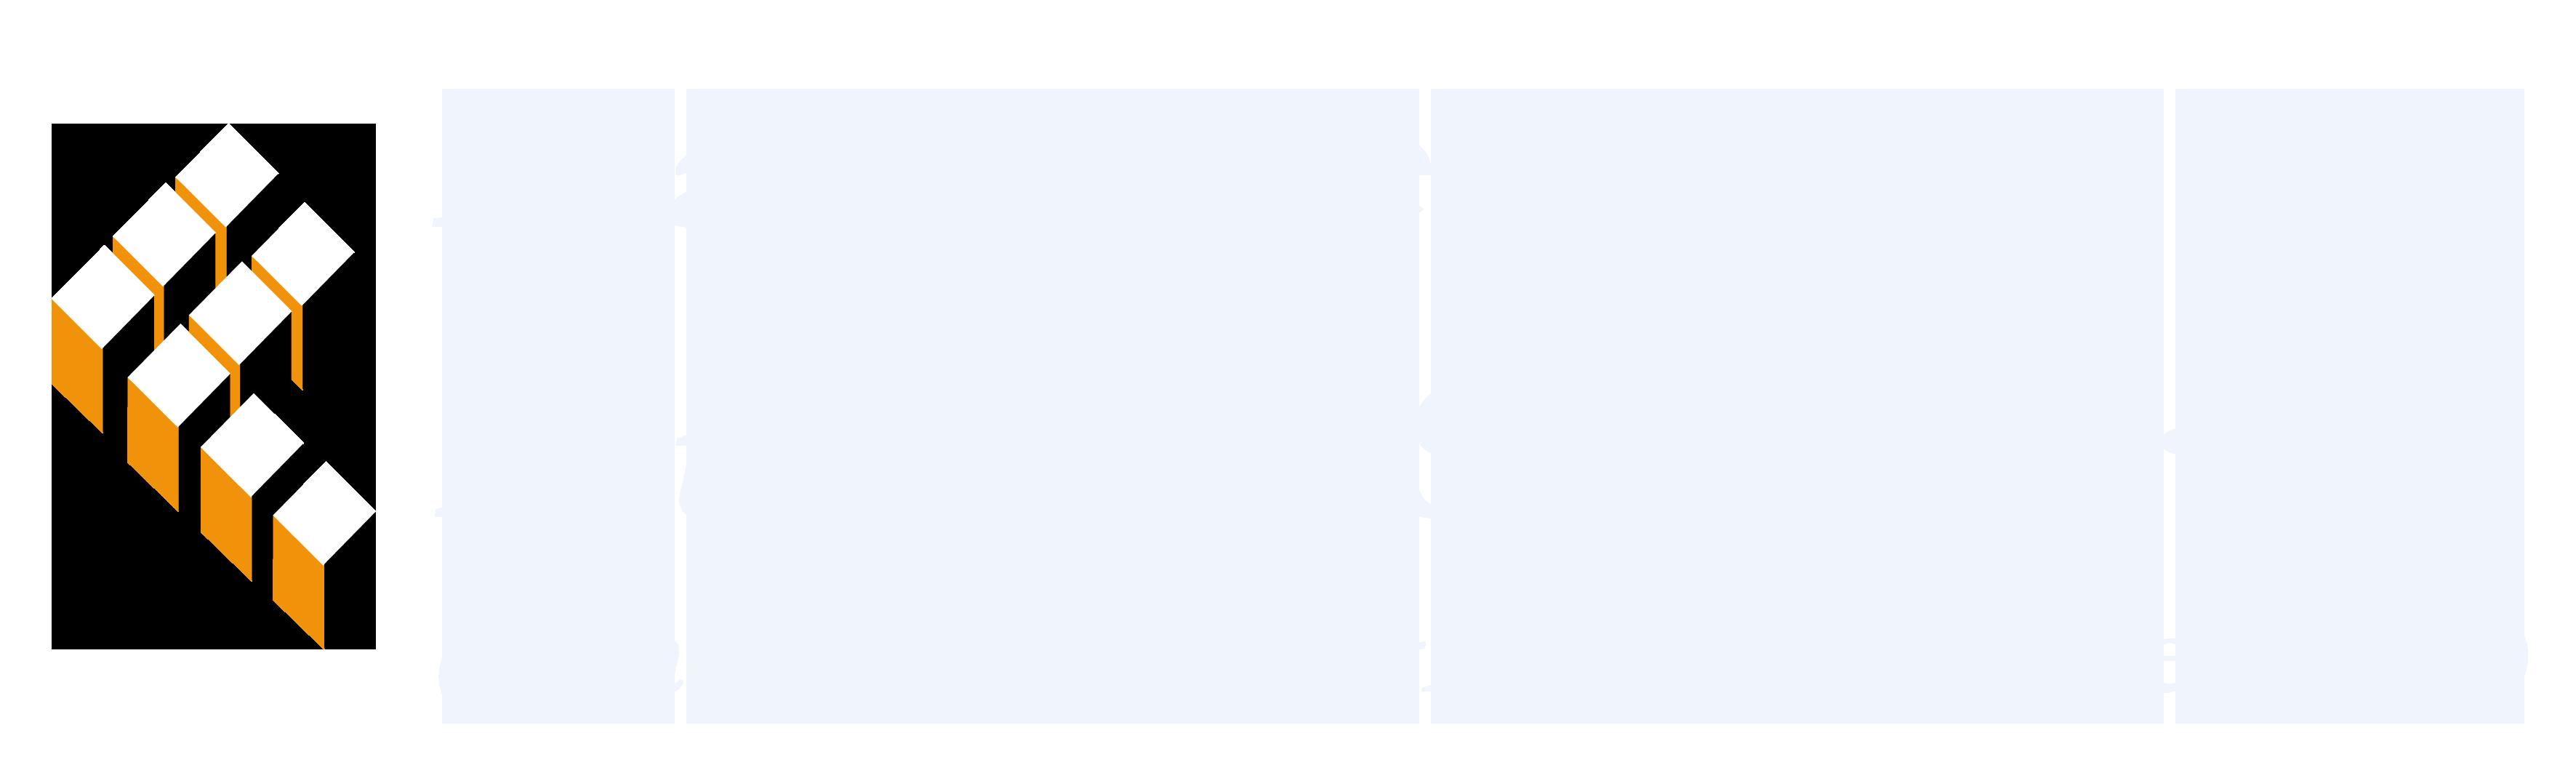 Frattura ed Integrità Strutturale